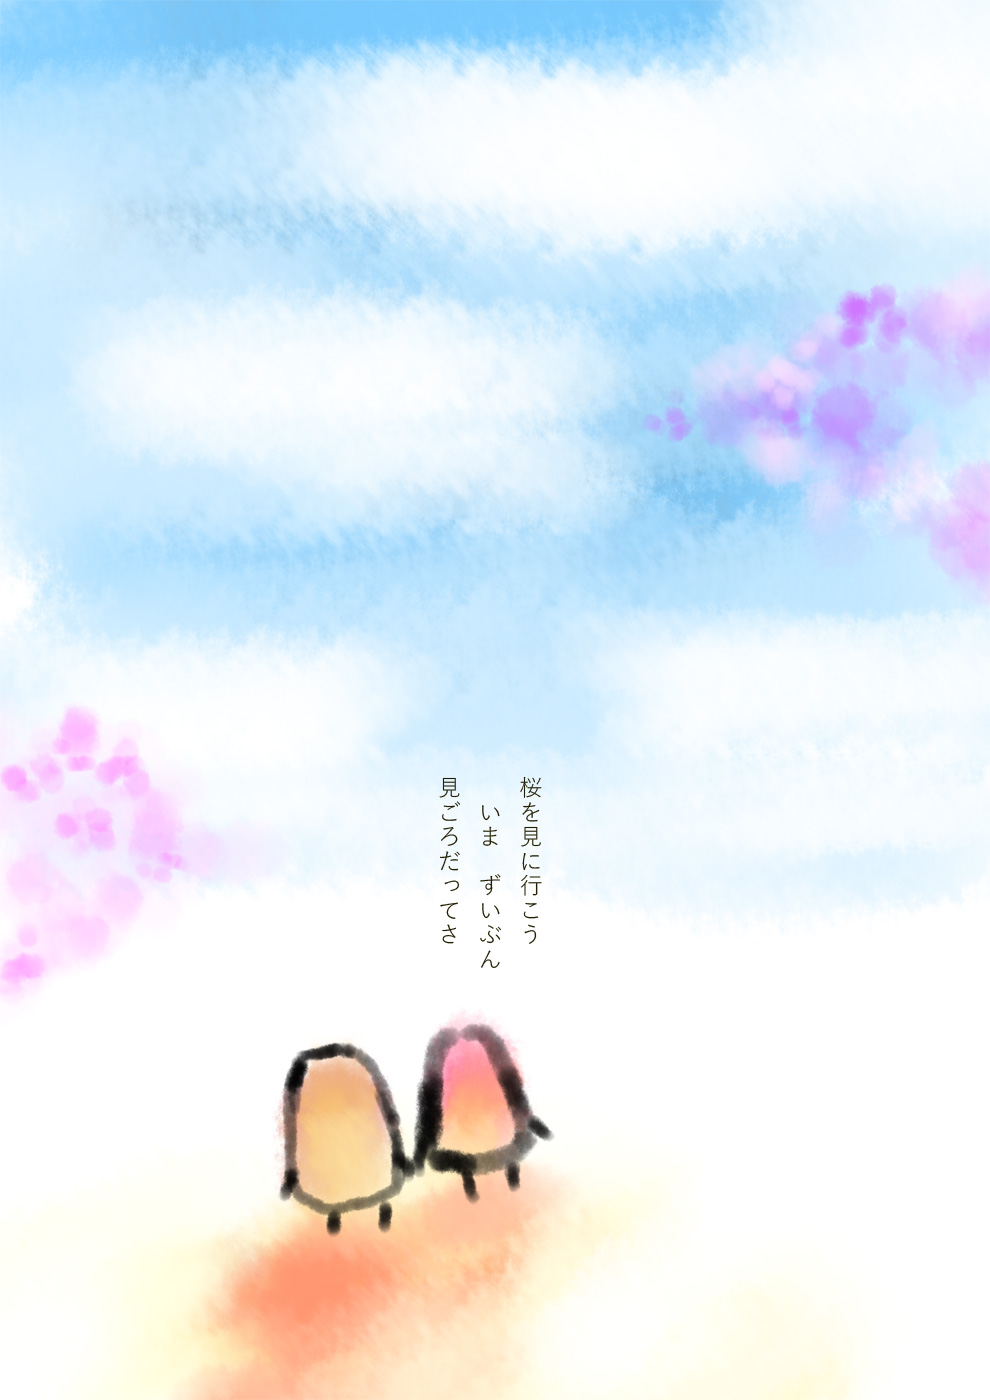 http://ahito.com/comic/short/nega/img/2018/20180320/02.jpg